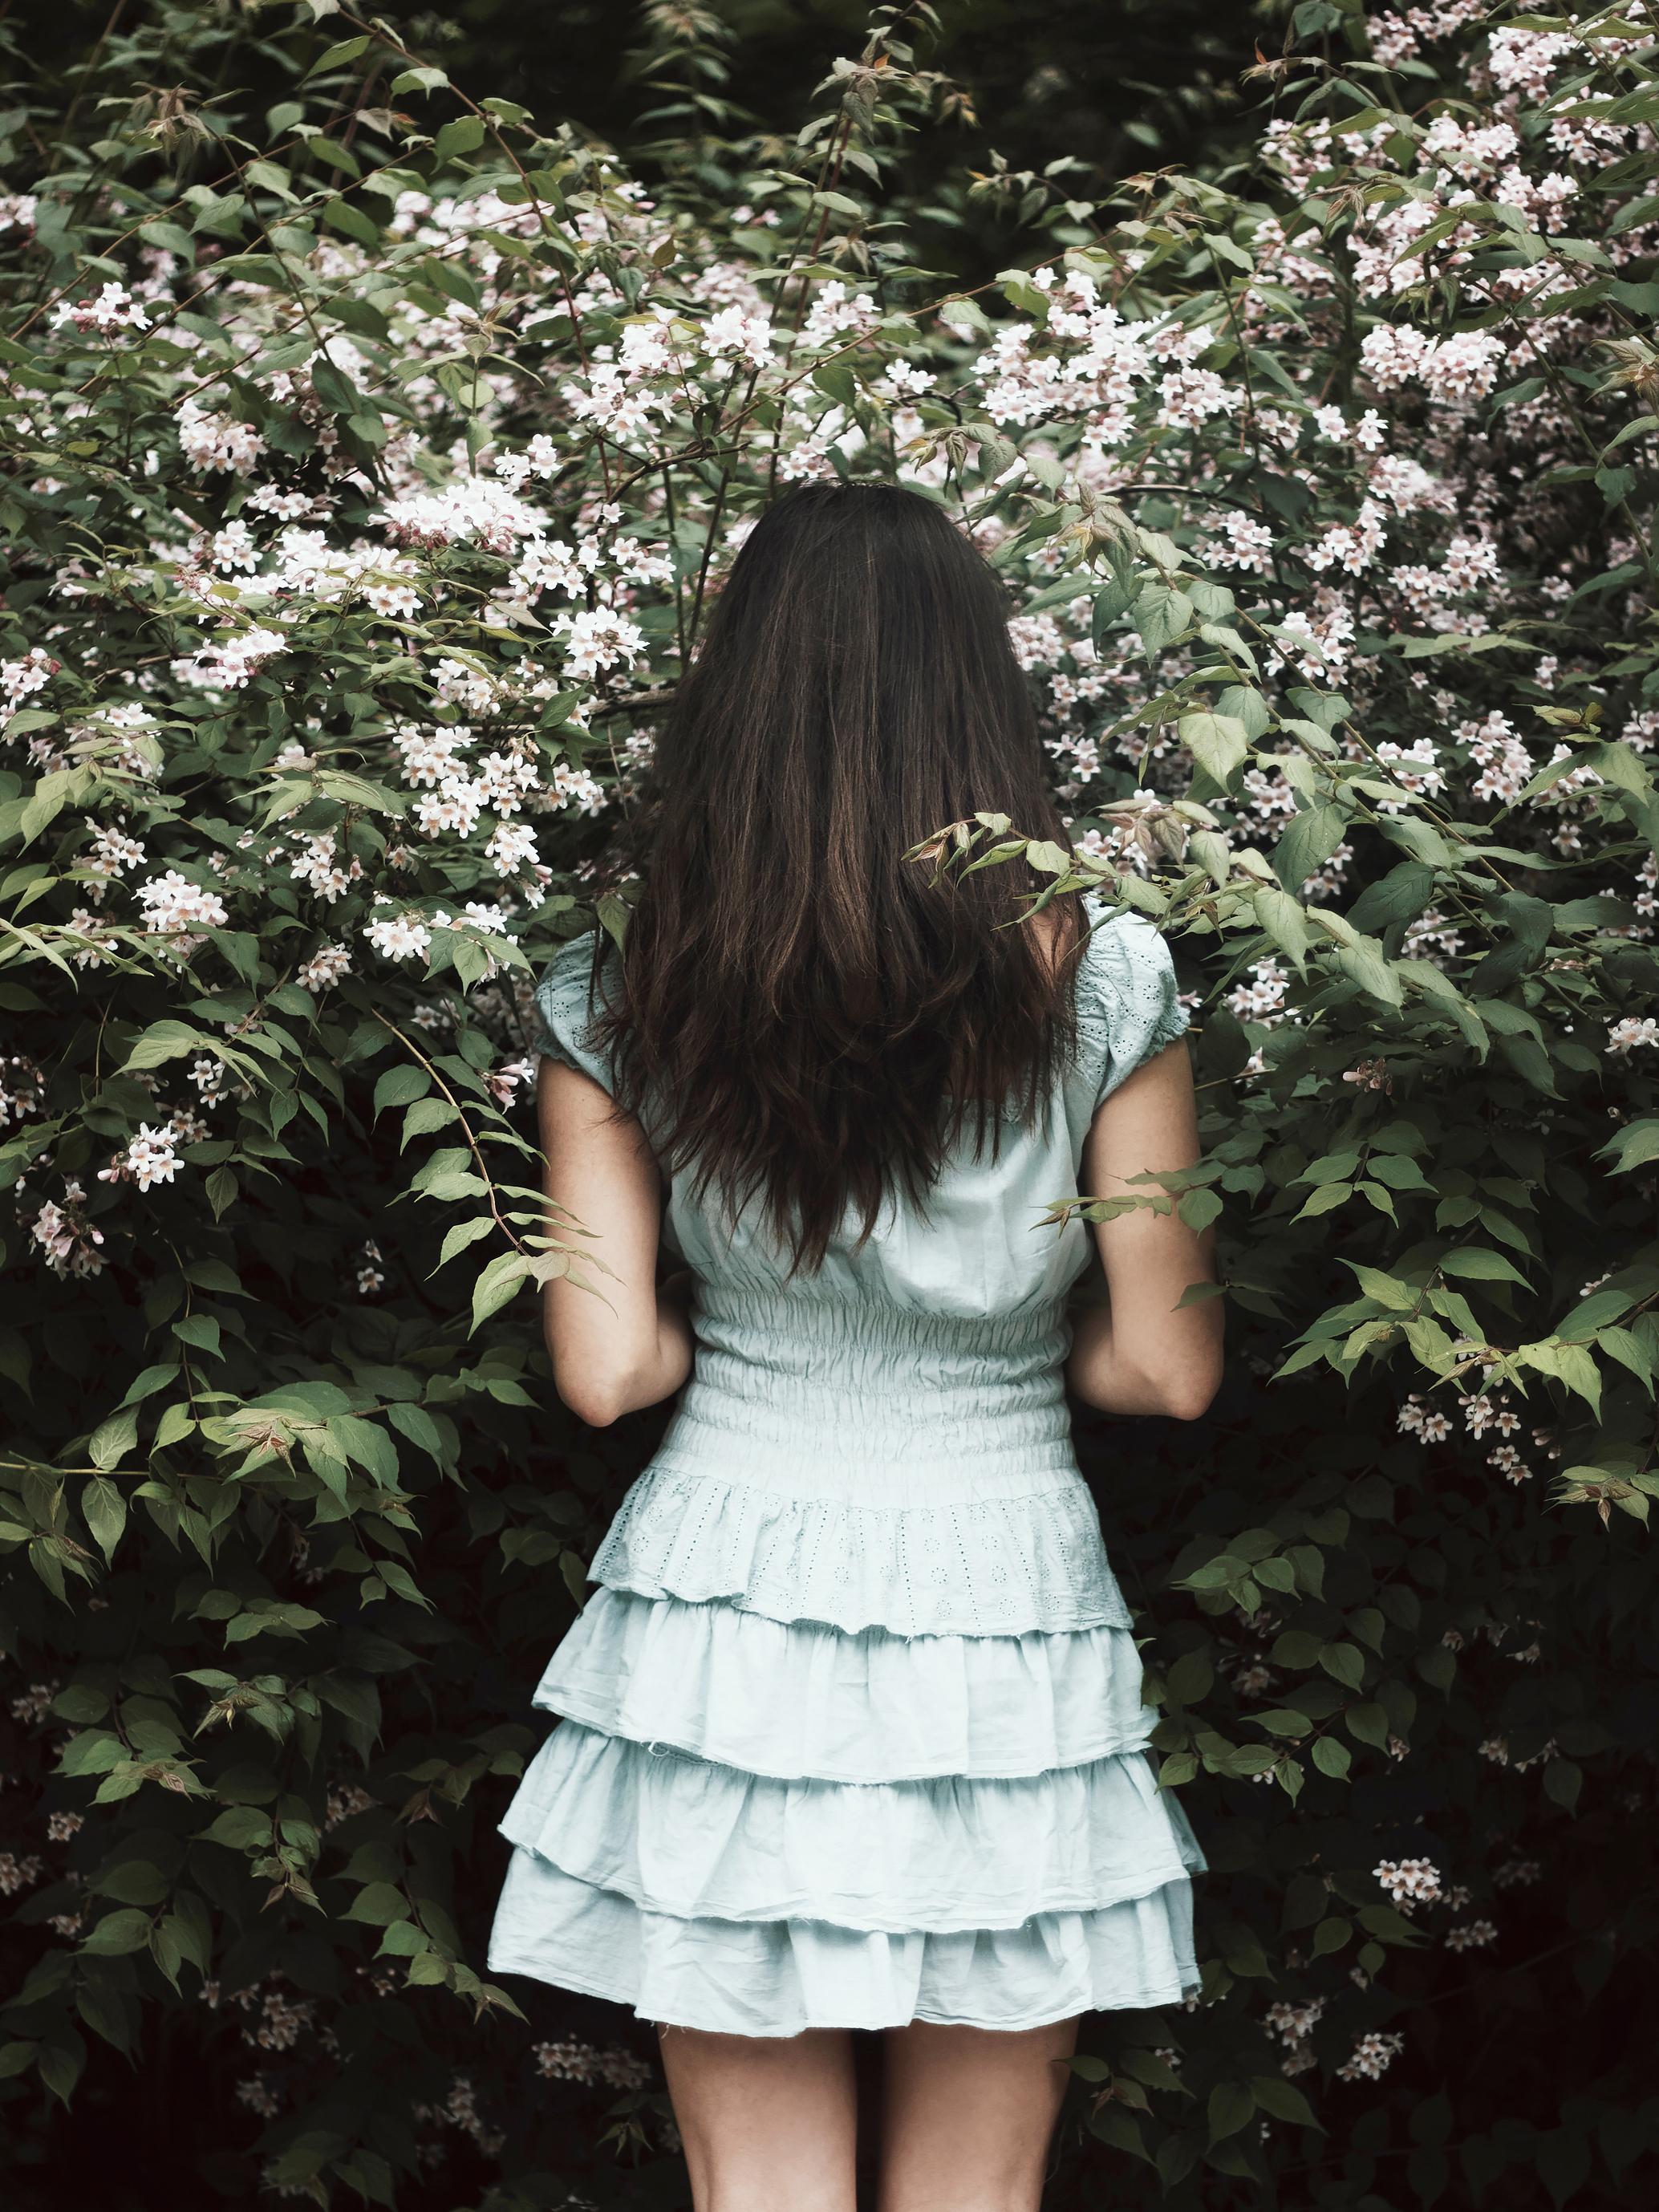 inside the garden blooming flowers - The Girls In The Garden